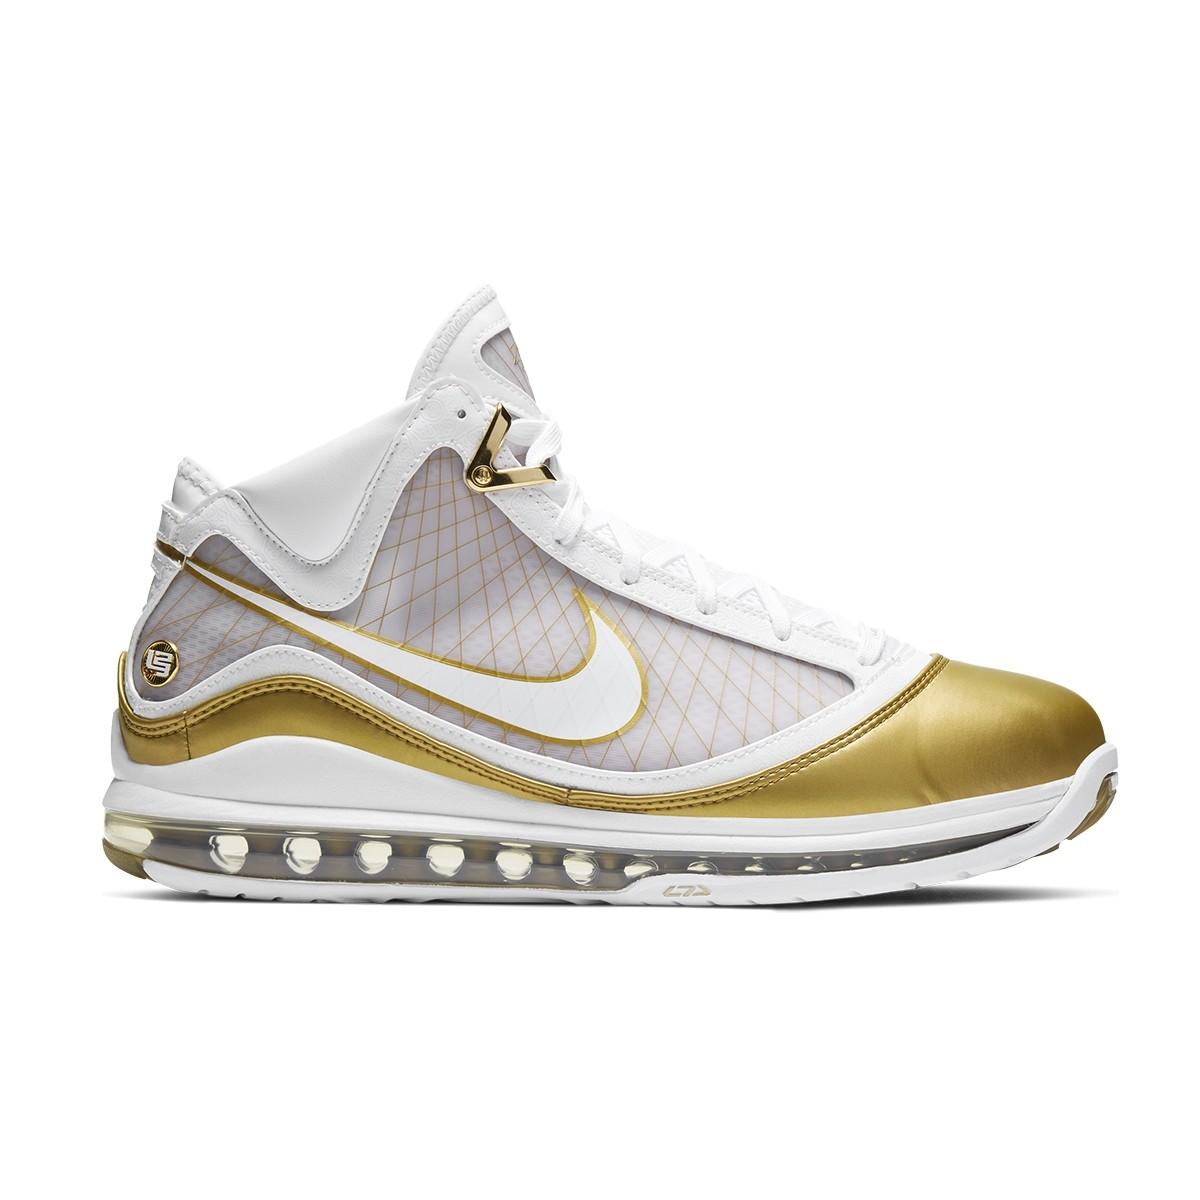 Nike Lebron 7 QS 'China Moon'